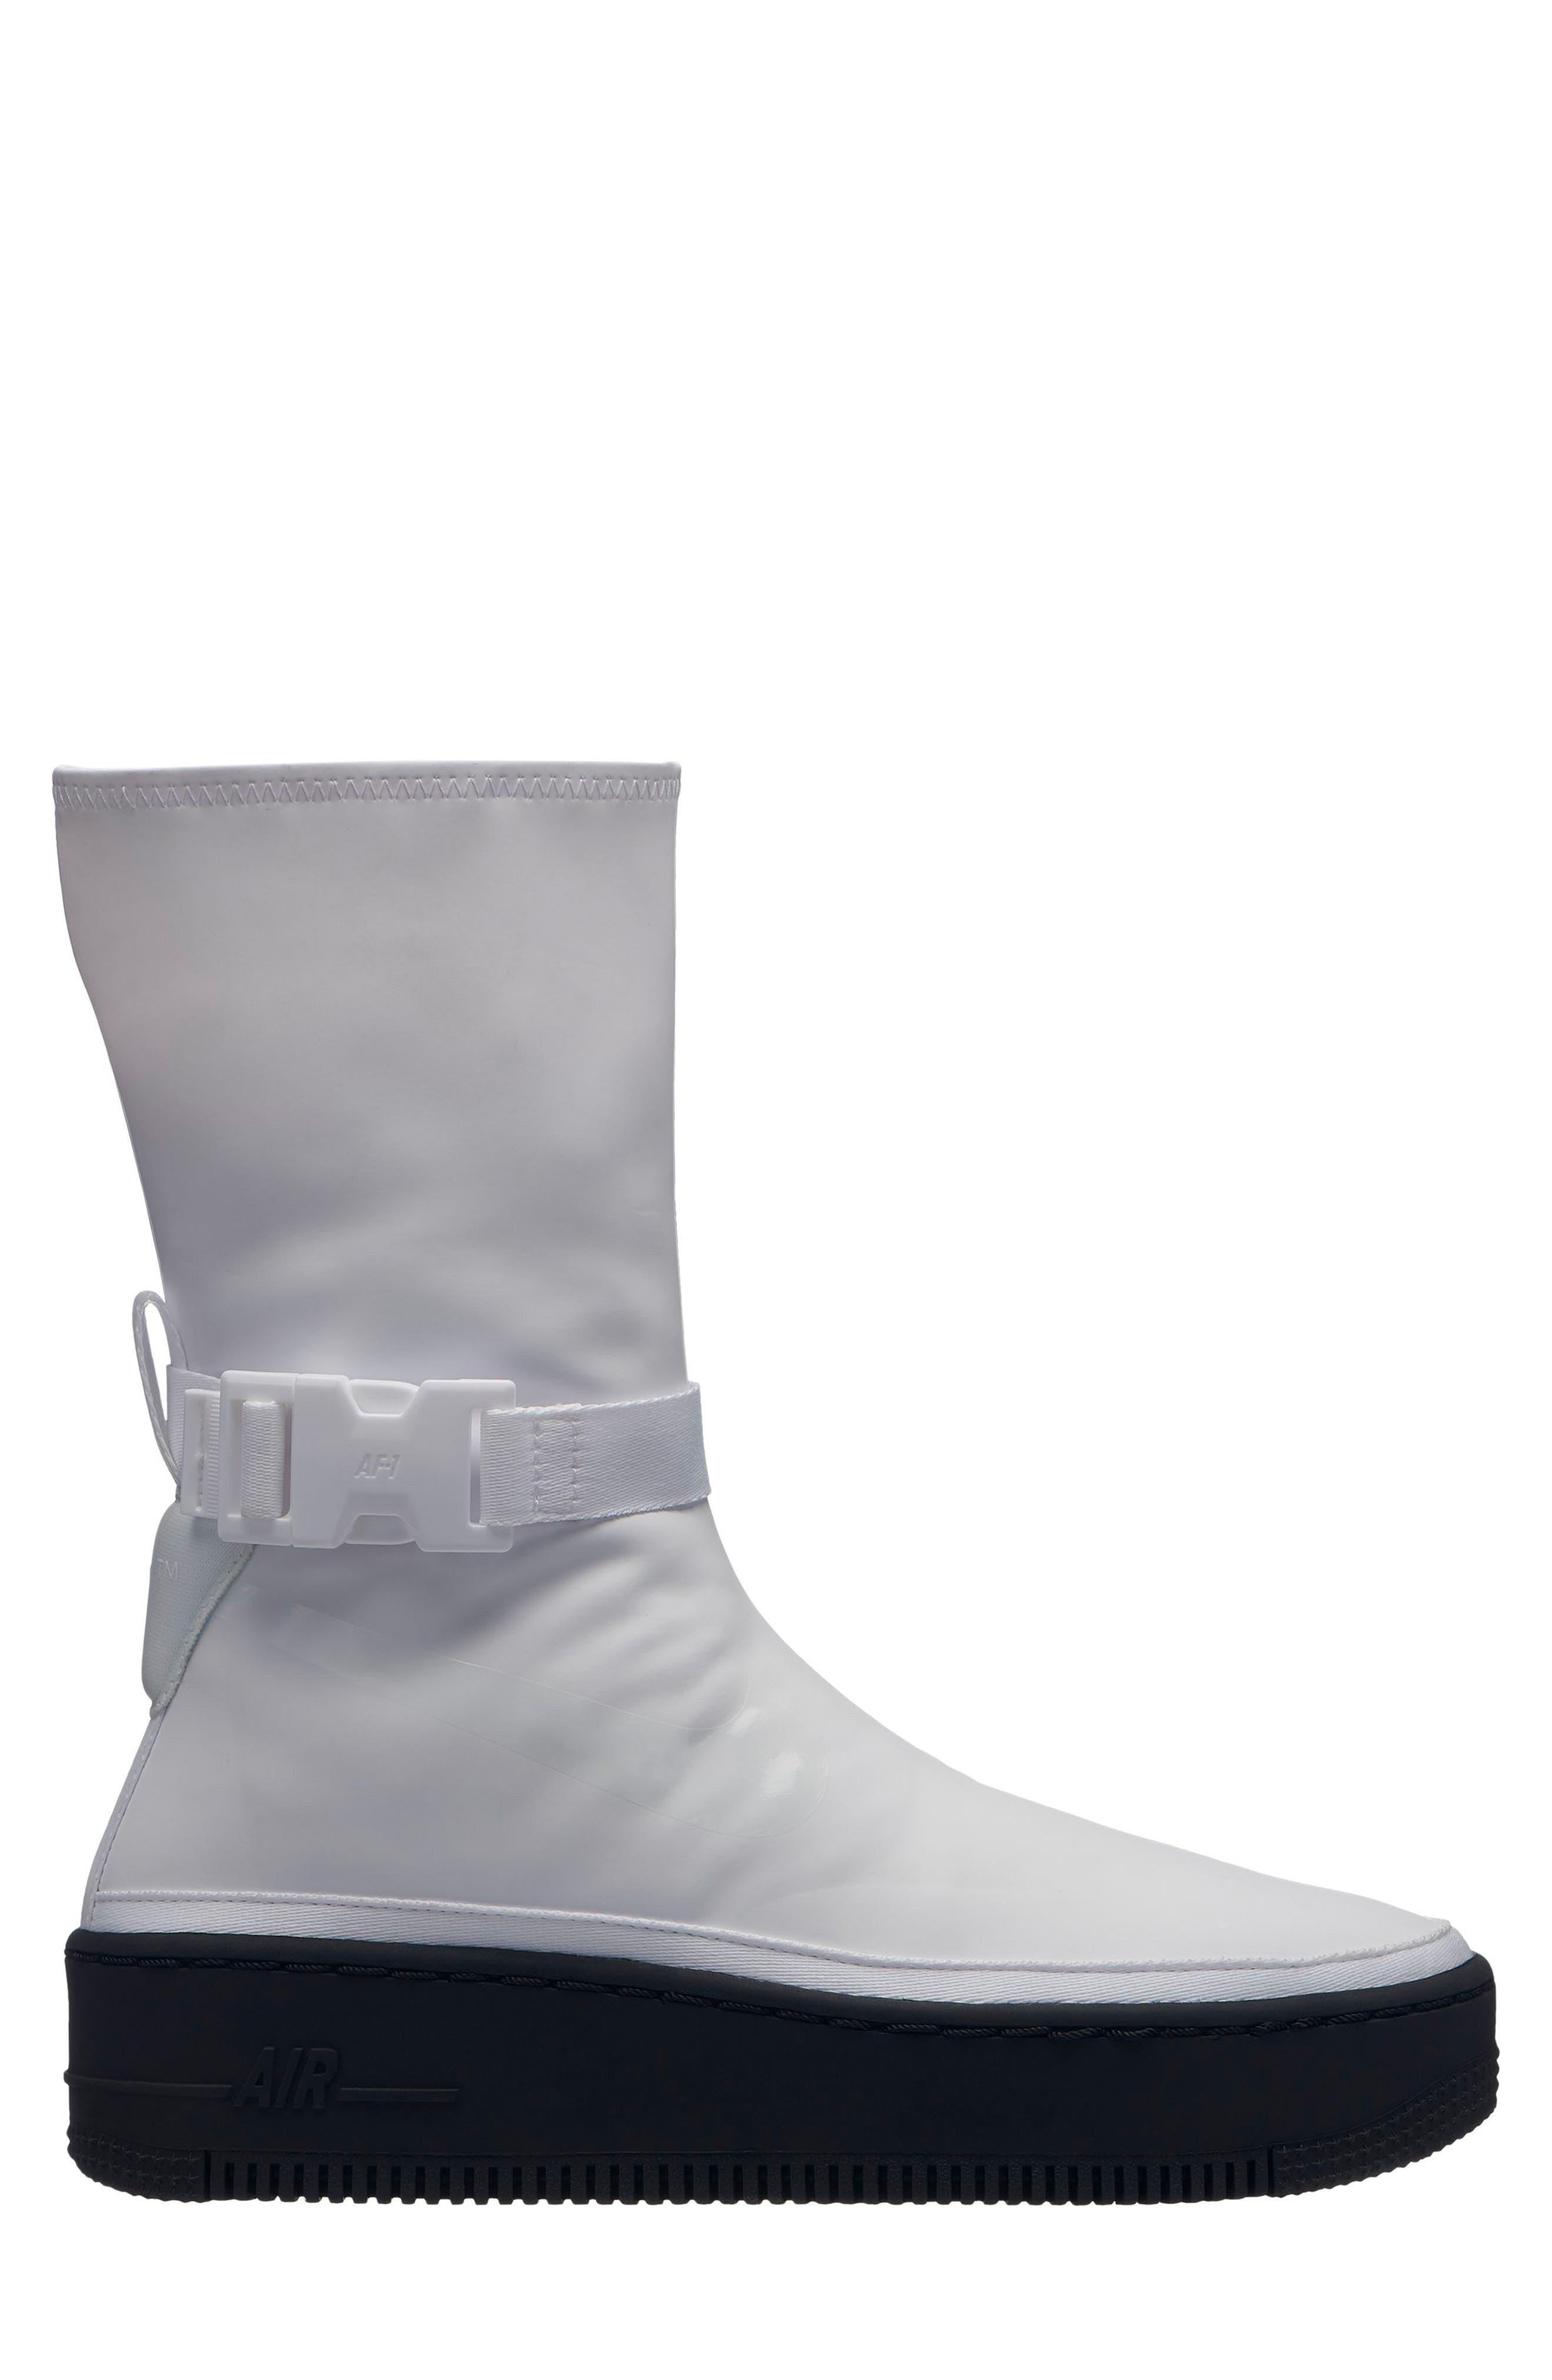 Air Force 1 Sage High Platform Sneaker,                             Main thumbnail 1, color,                             WHITE/ WHITE/ BLACK